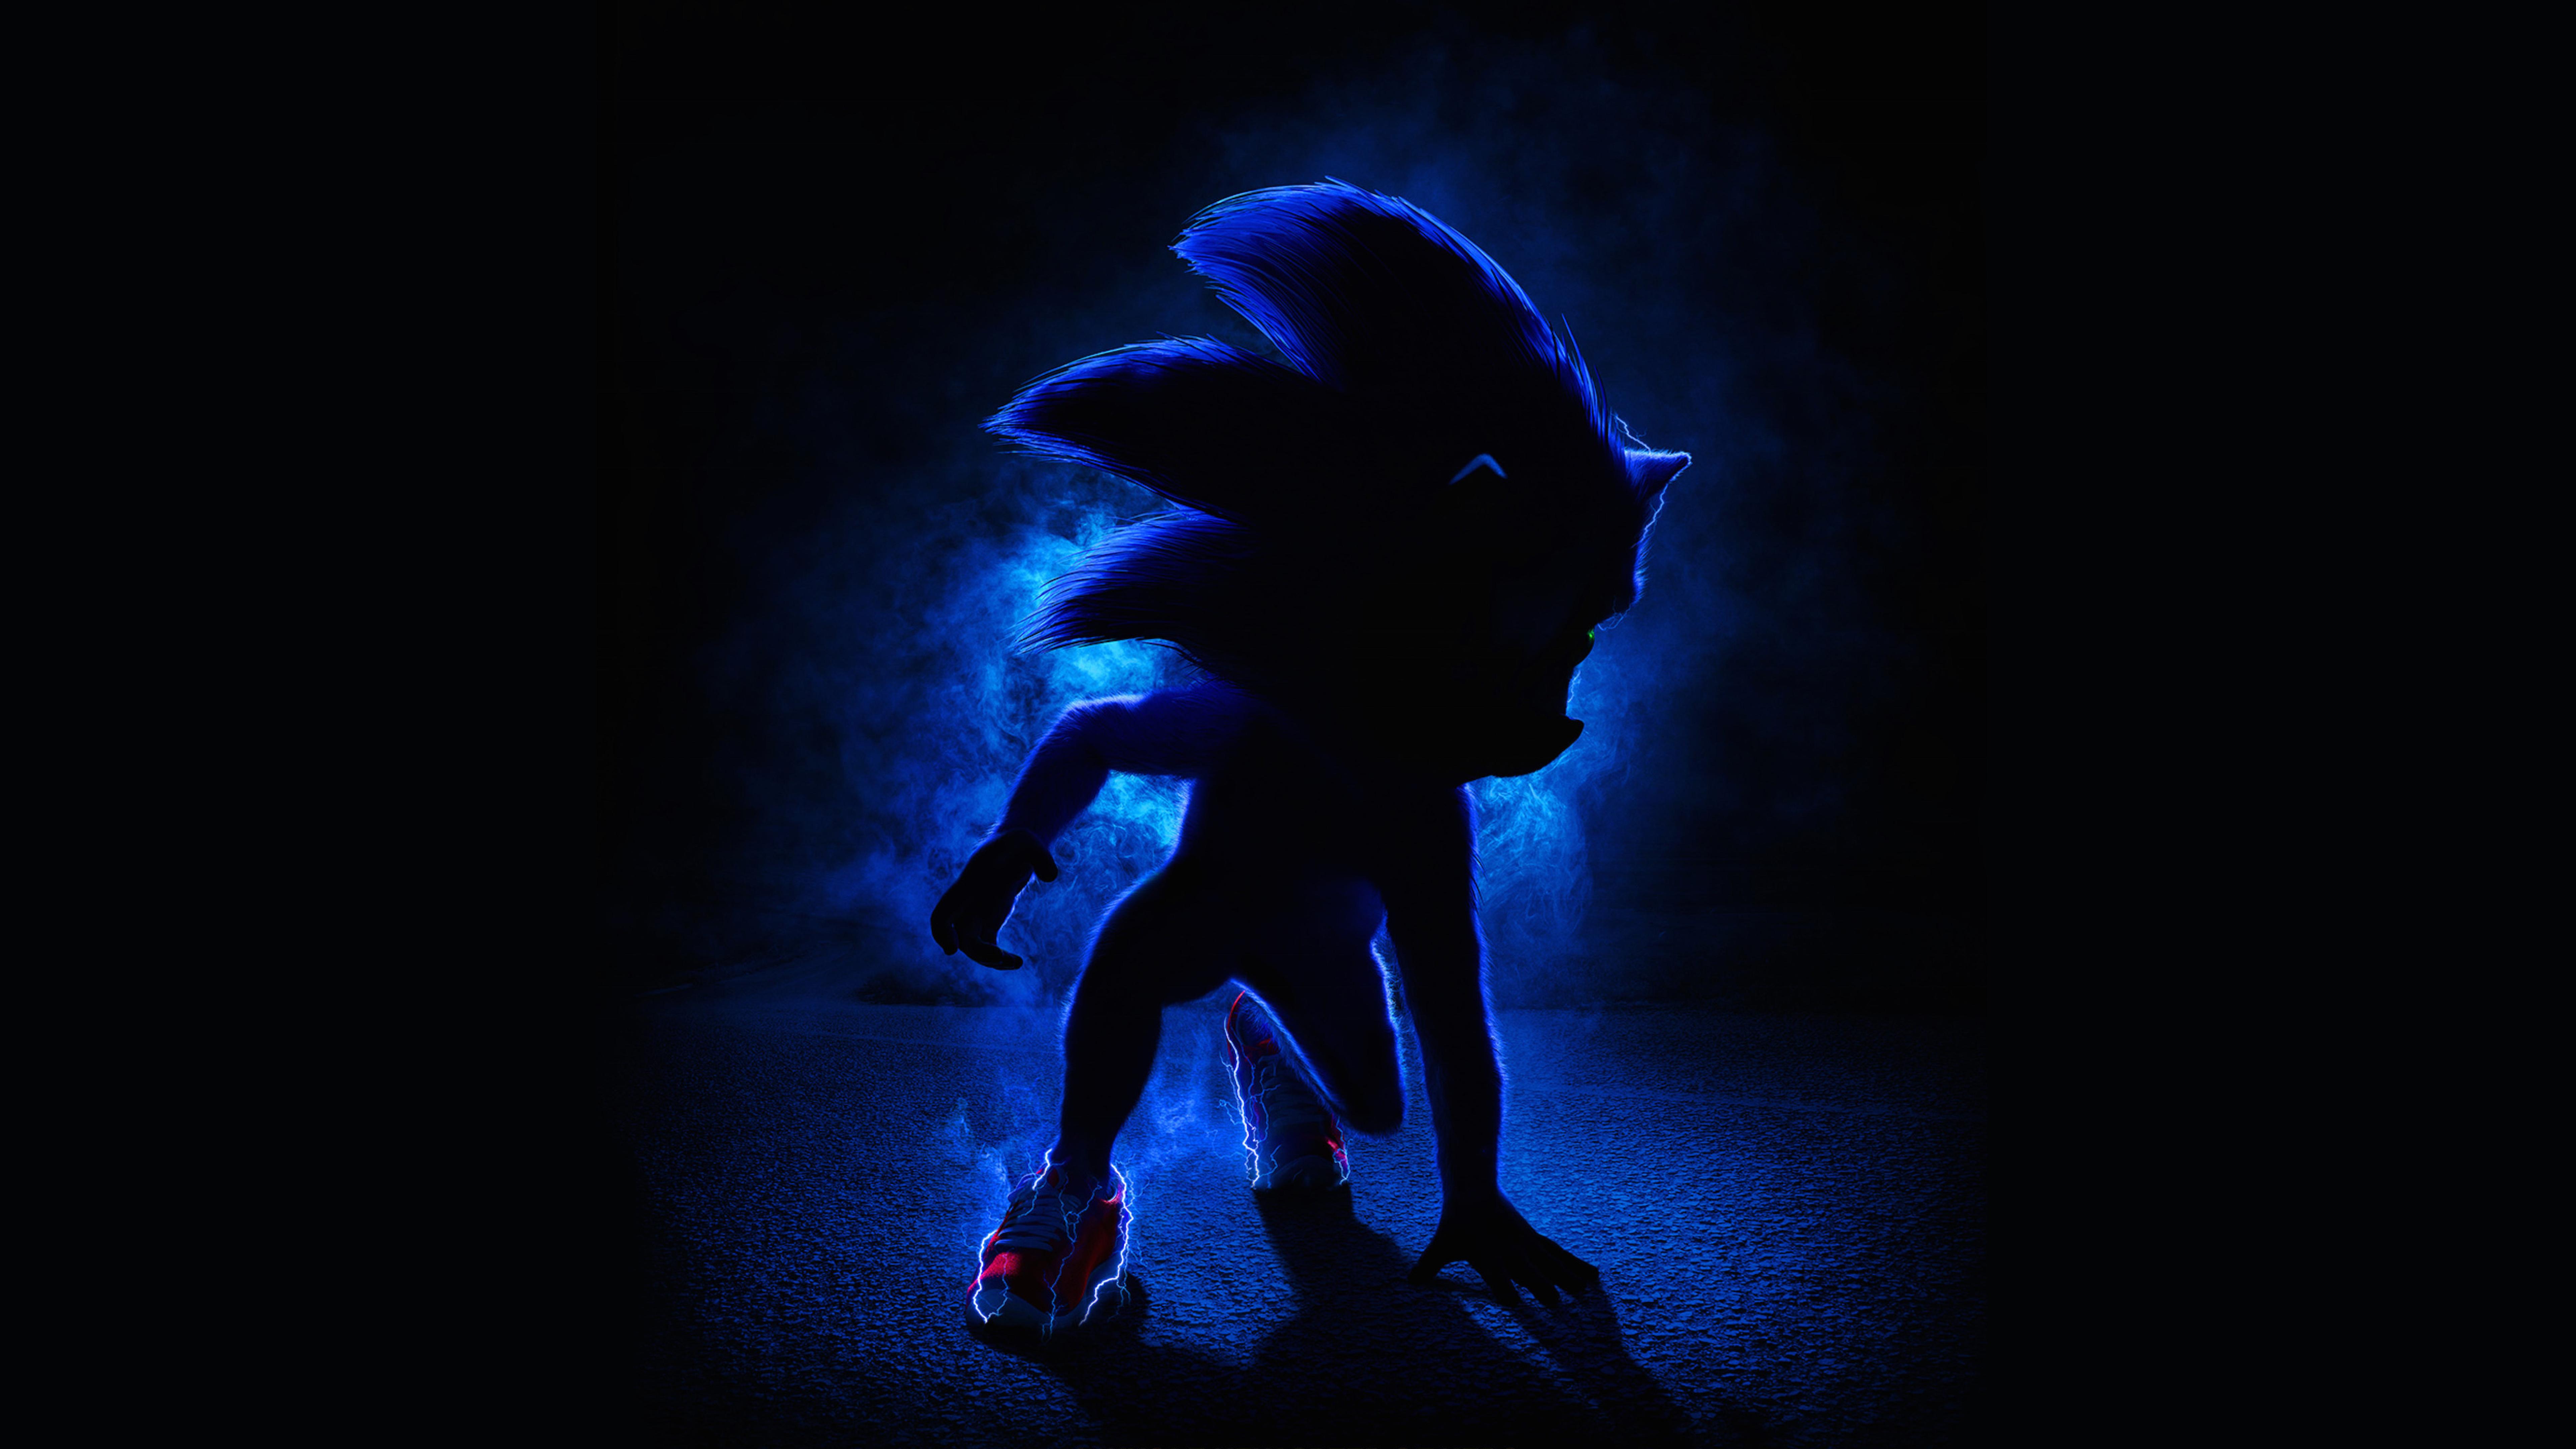 7680x4320 Sonic the Hedgehog 2019 Movie Poster 8K Wallpaper HD 7680x4320